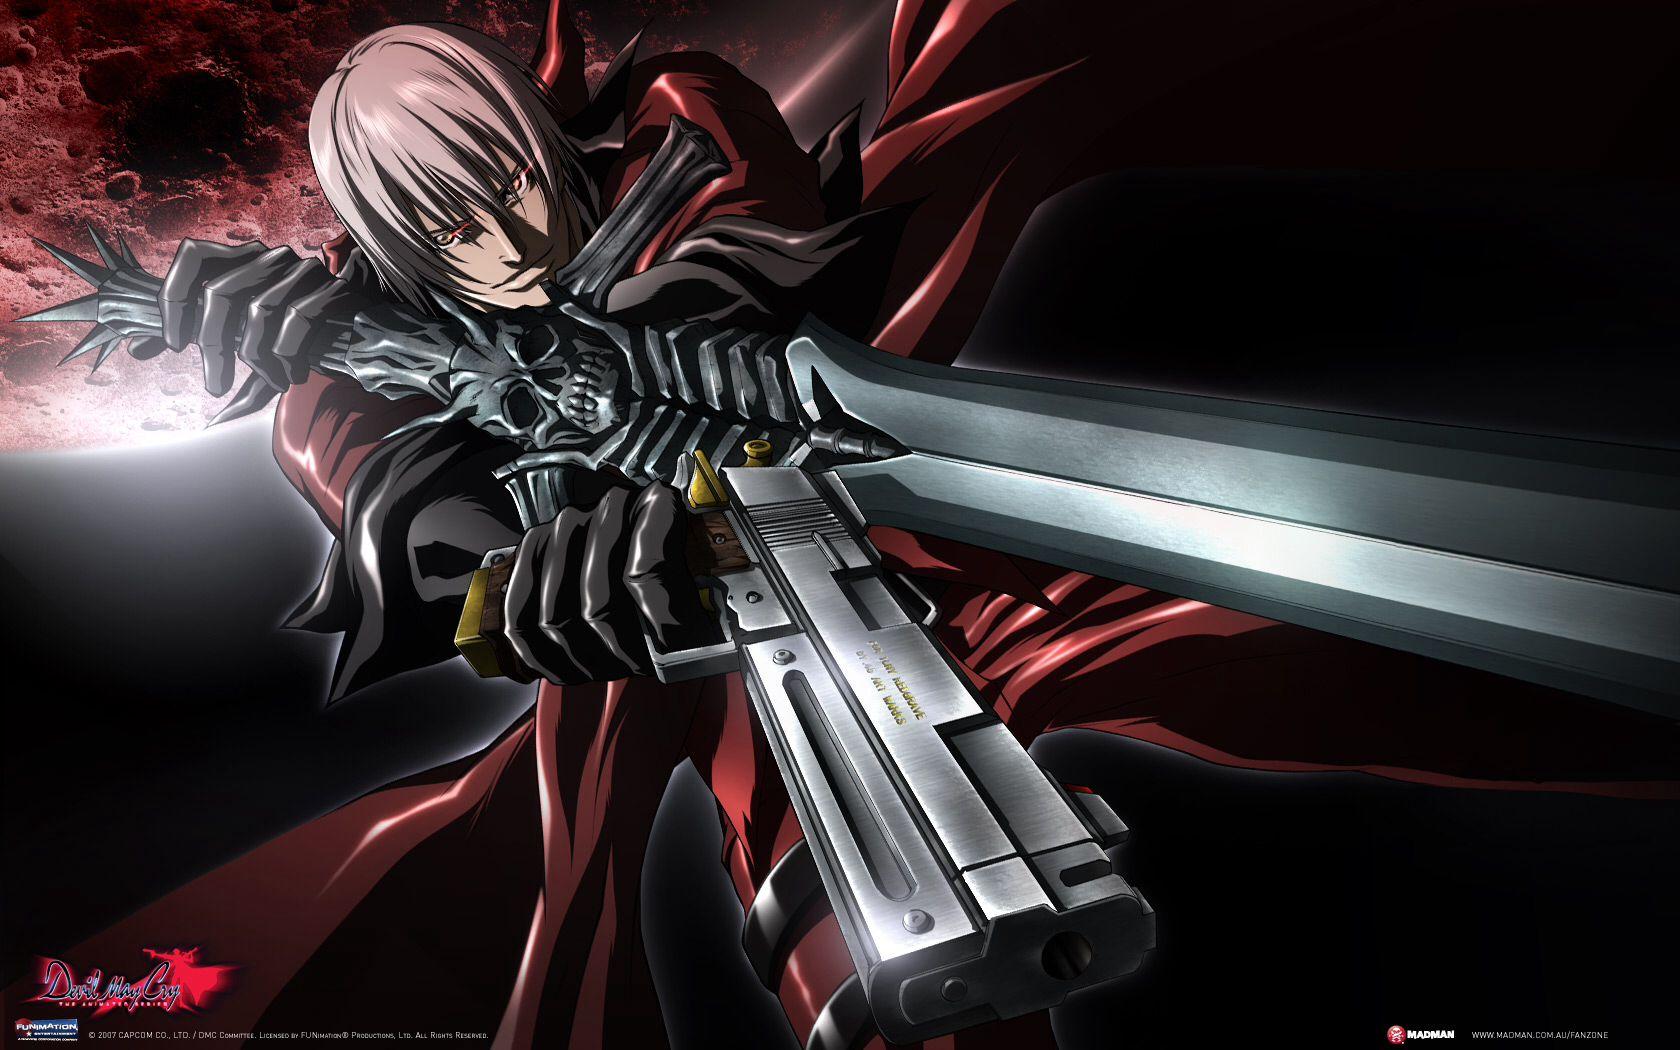 Dante Devil May Cry Anime, Manga, Otaku Pinterest